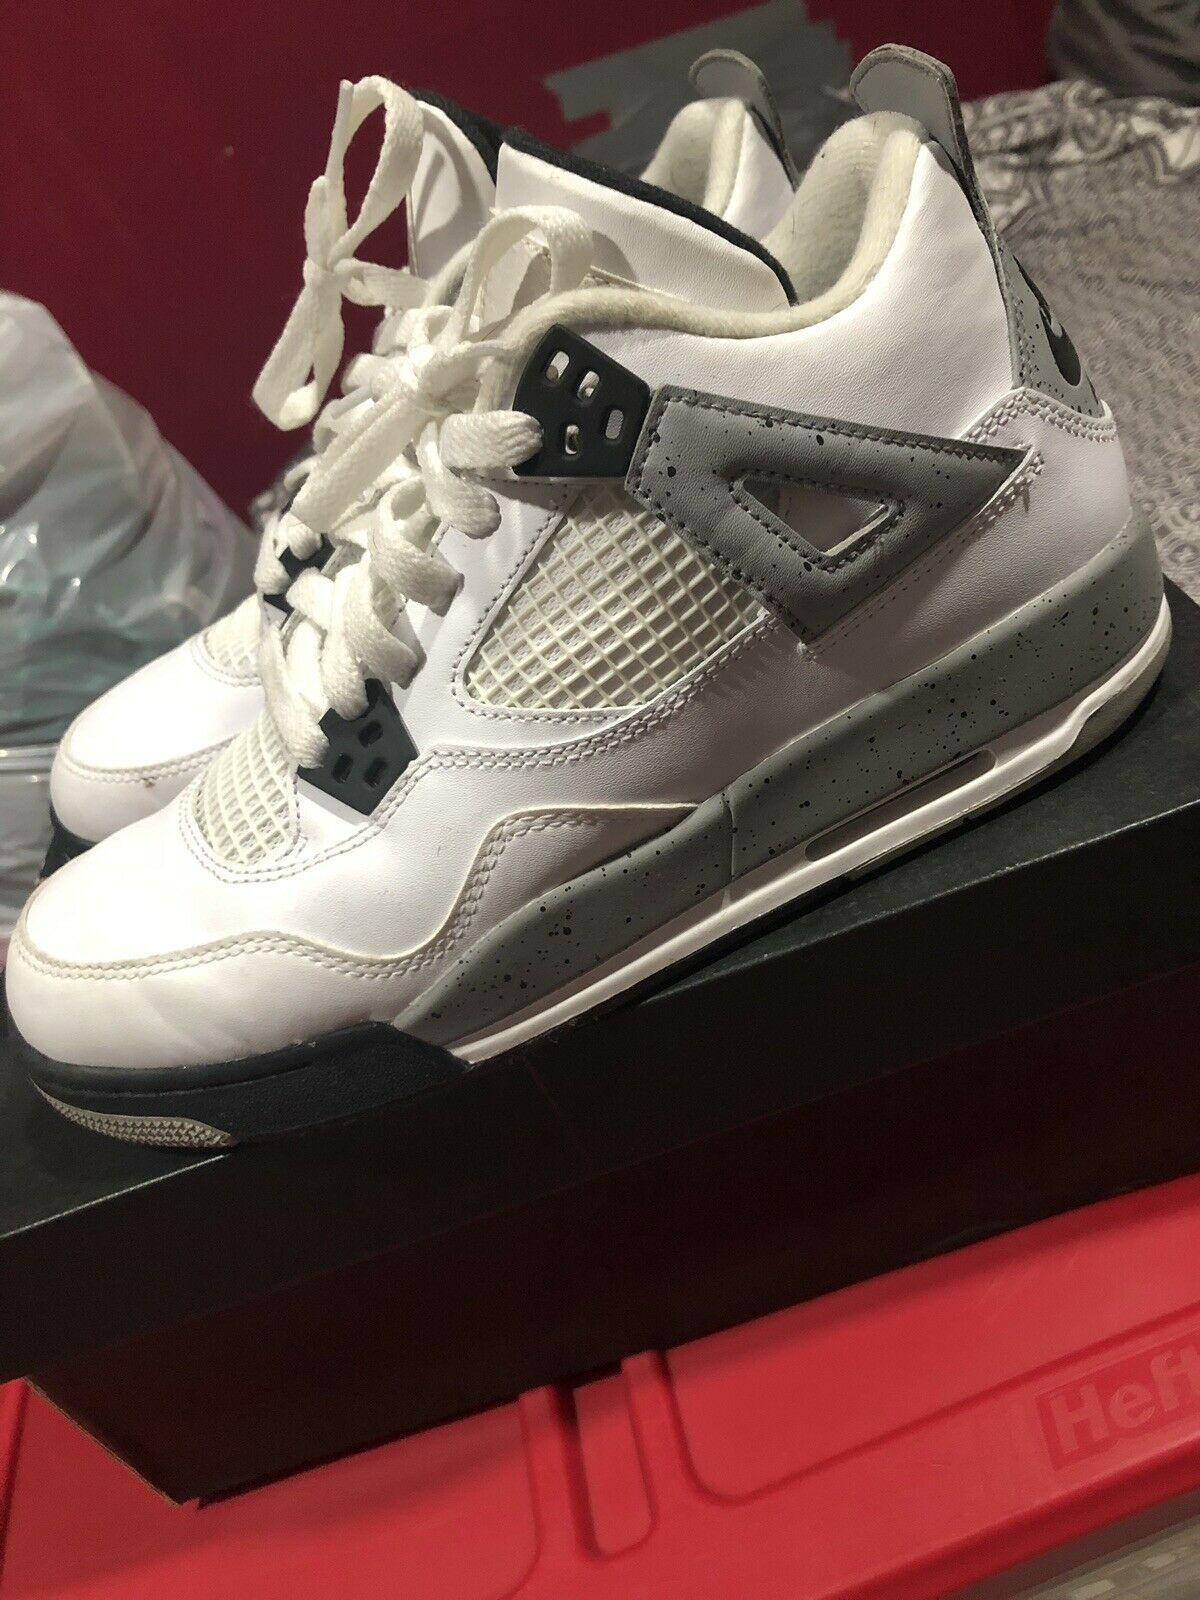 Air Jordan Retro bianca Cement 4 IV Dimensione 6.5 OG scatola Sautope classeiche da uomo